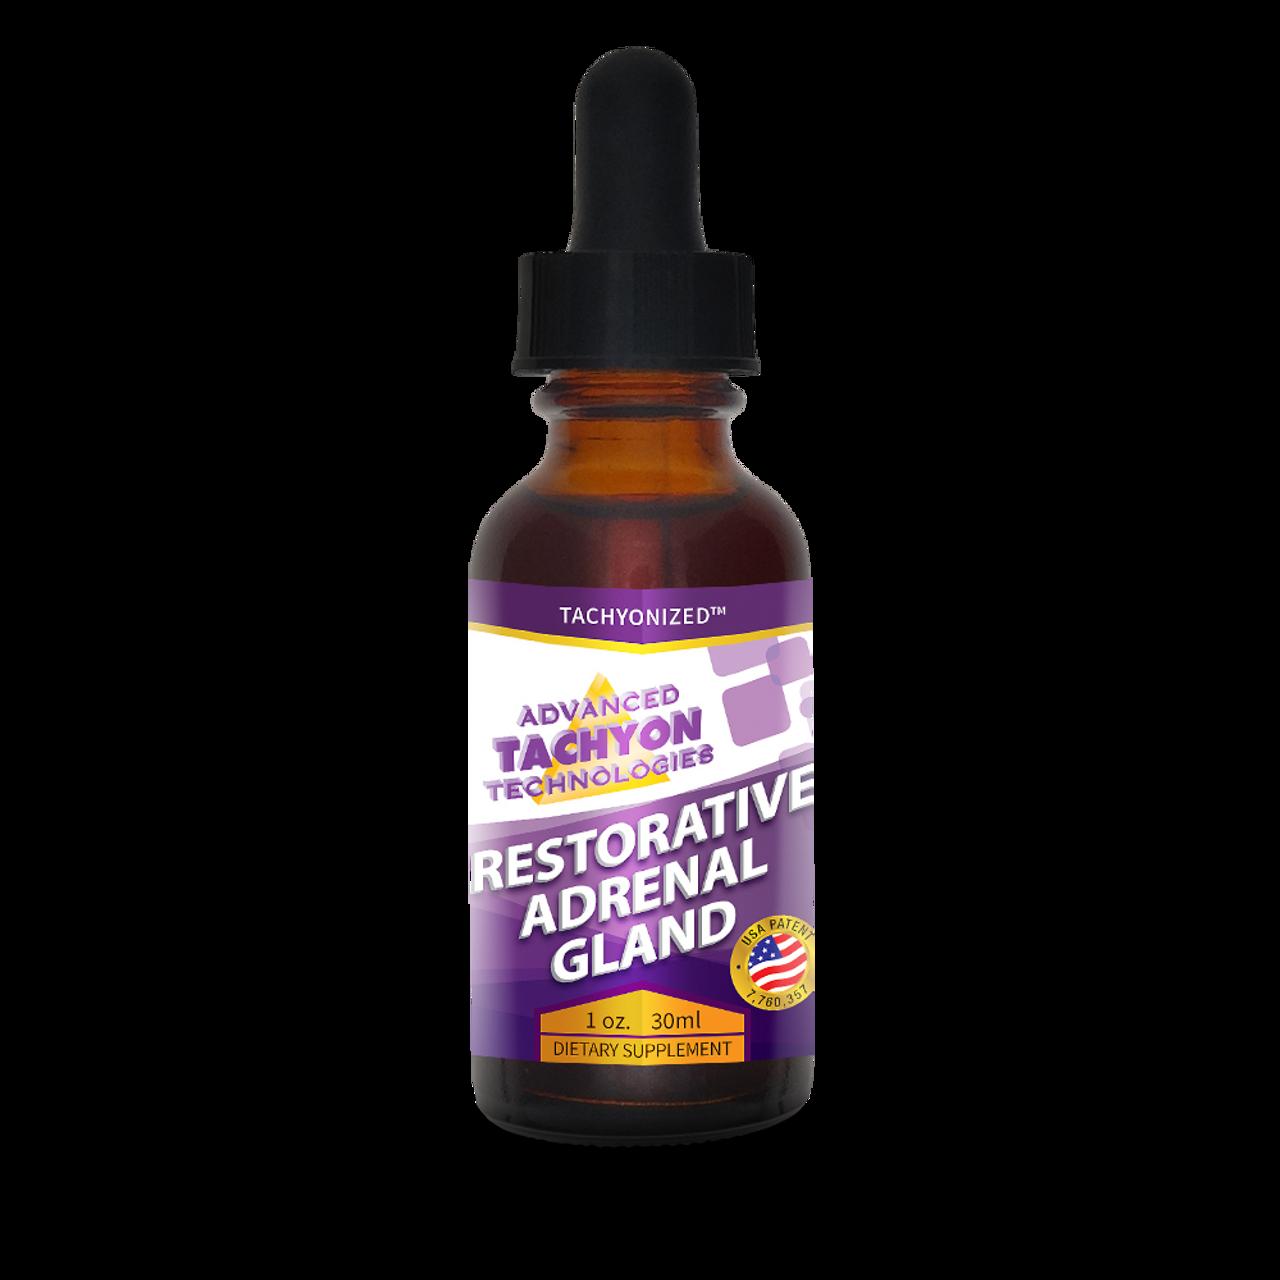 Tachyonized Restorative Adrenal Gland Tonic Advanced Tachyon